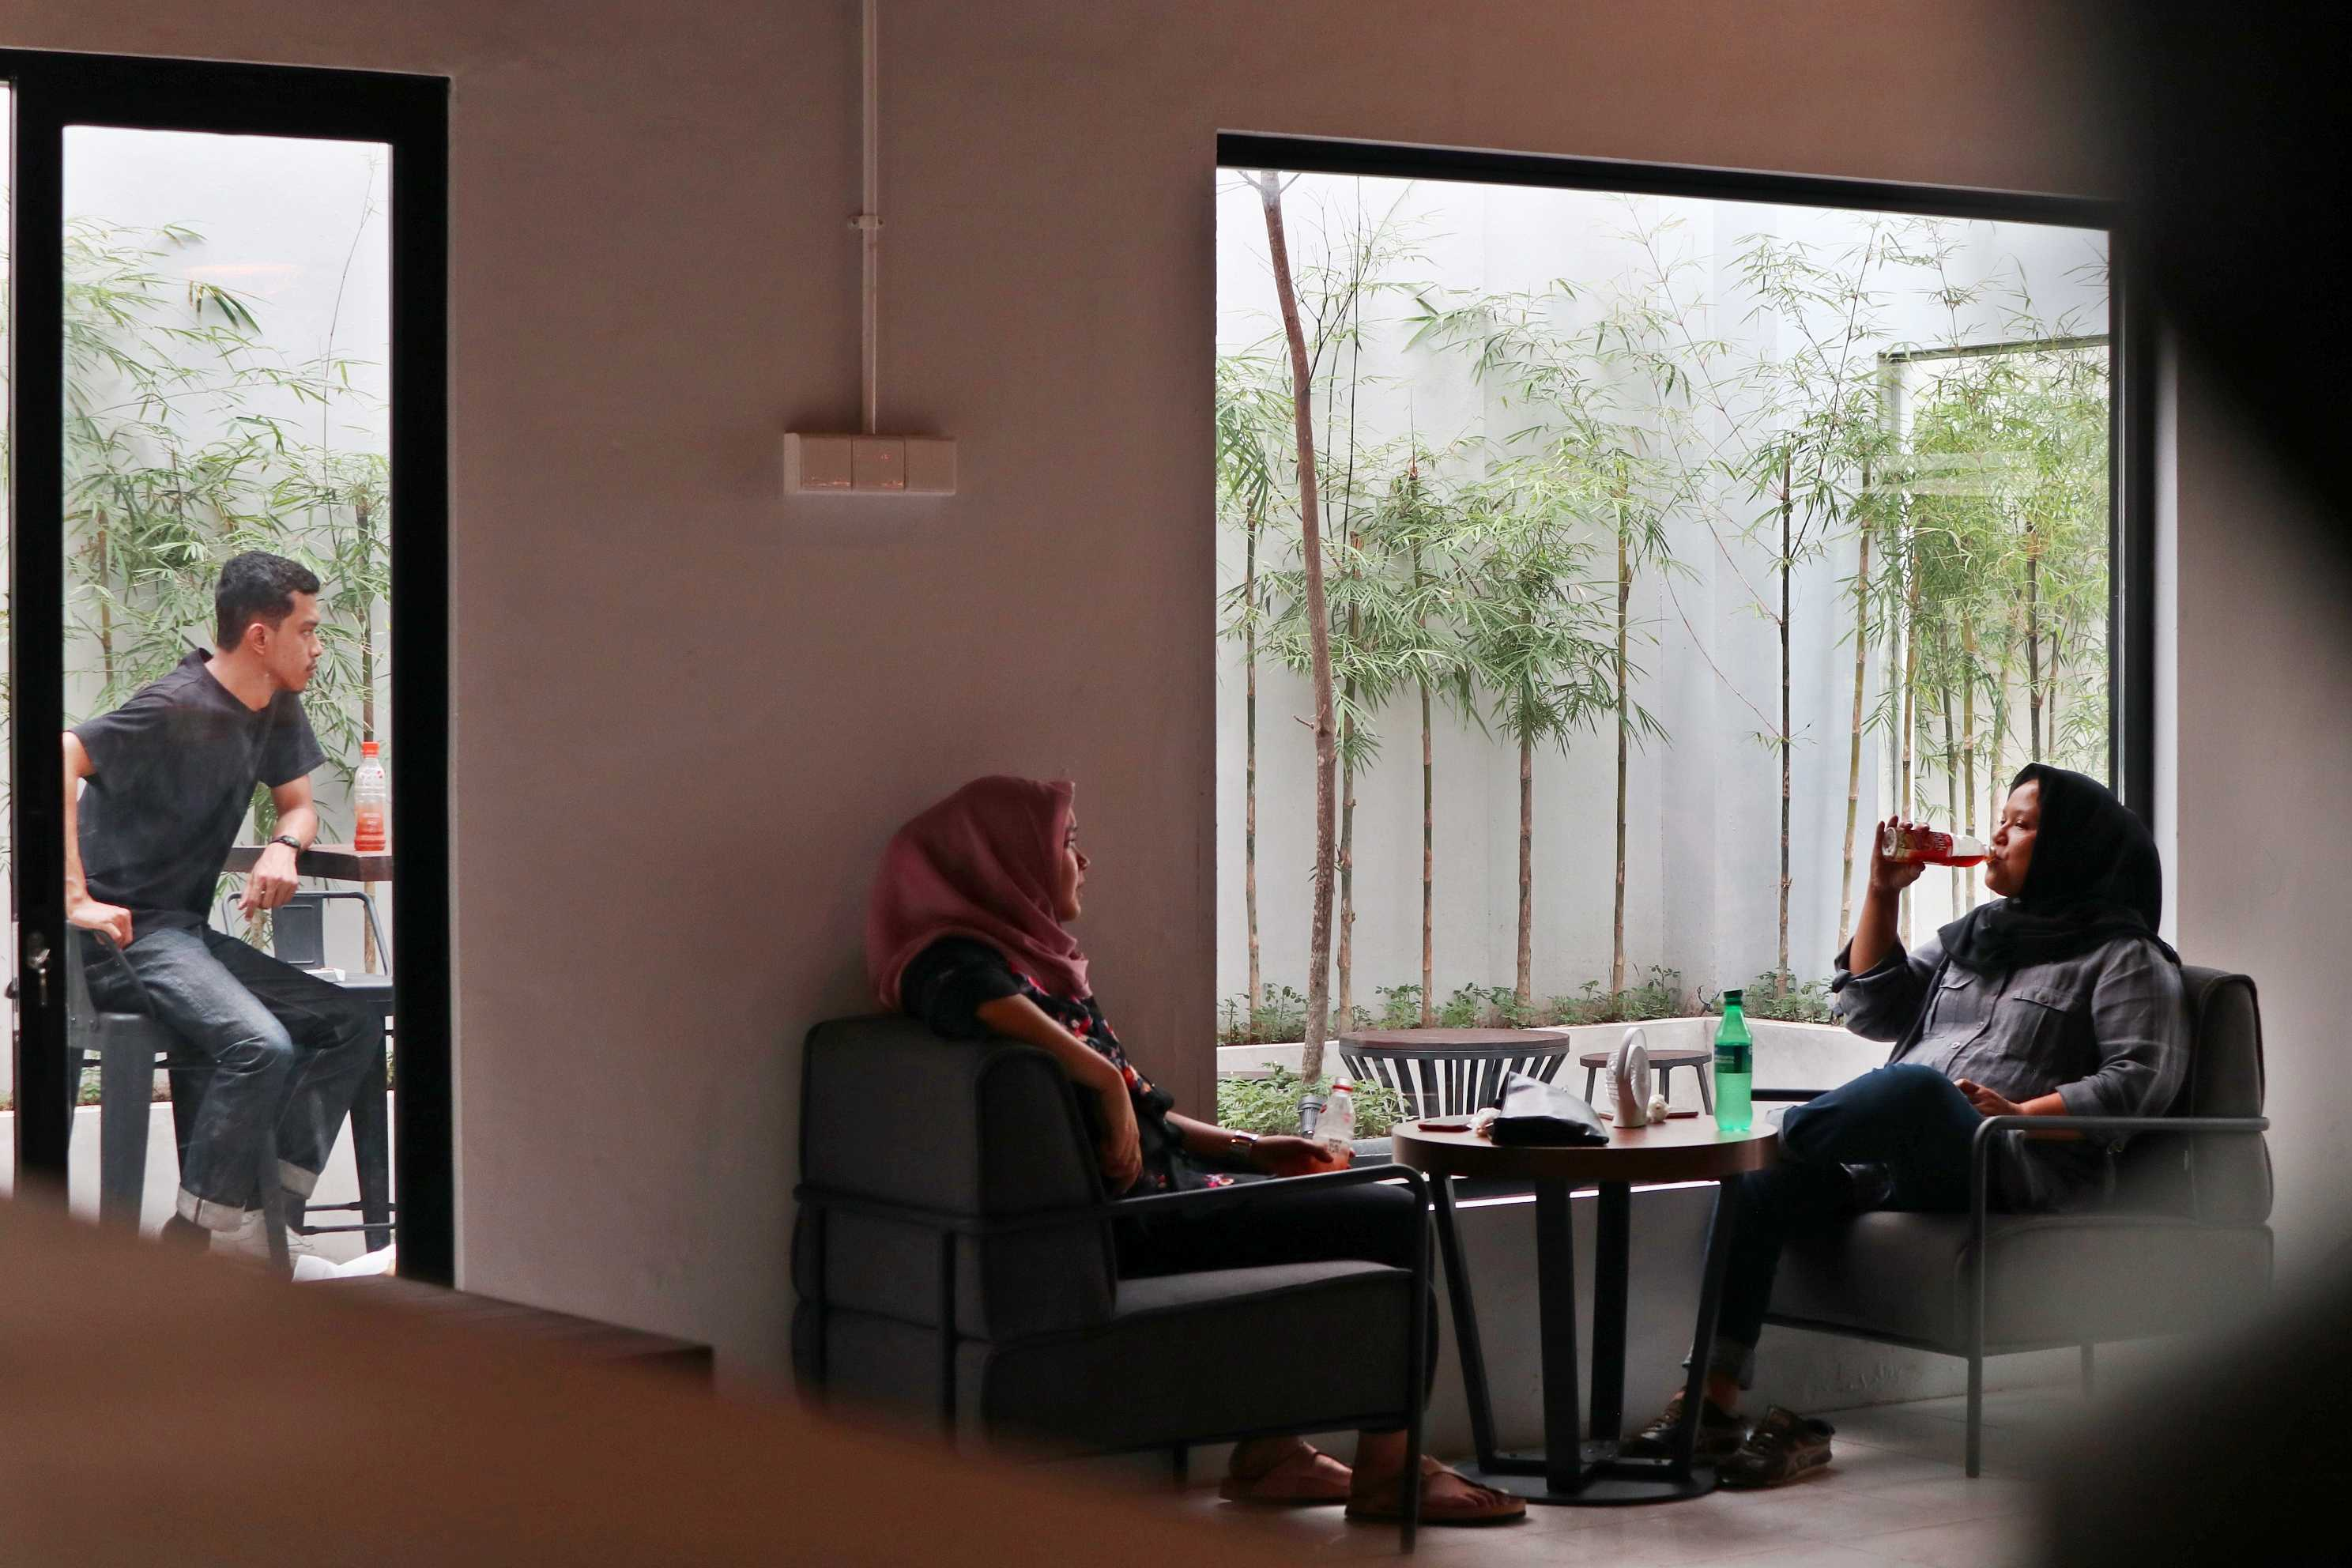 Bd Studio Tamoe Coffee & Resto Medan, Kota Medan, Sumatera Utara, Indonesia Medan, Kota Medan, Sumatera Utara, Indonesia Bd-Studio-Tamoe-Coffee-Resto   80736